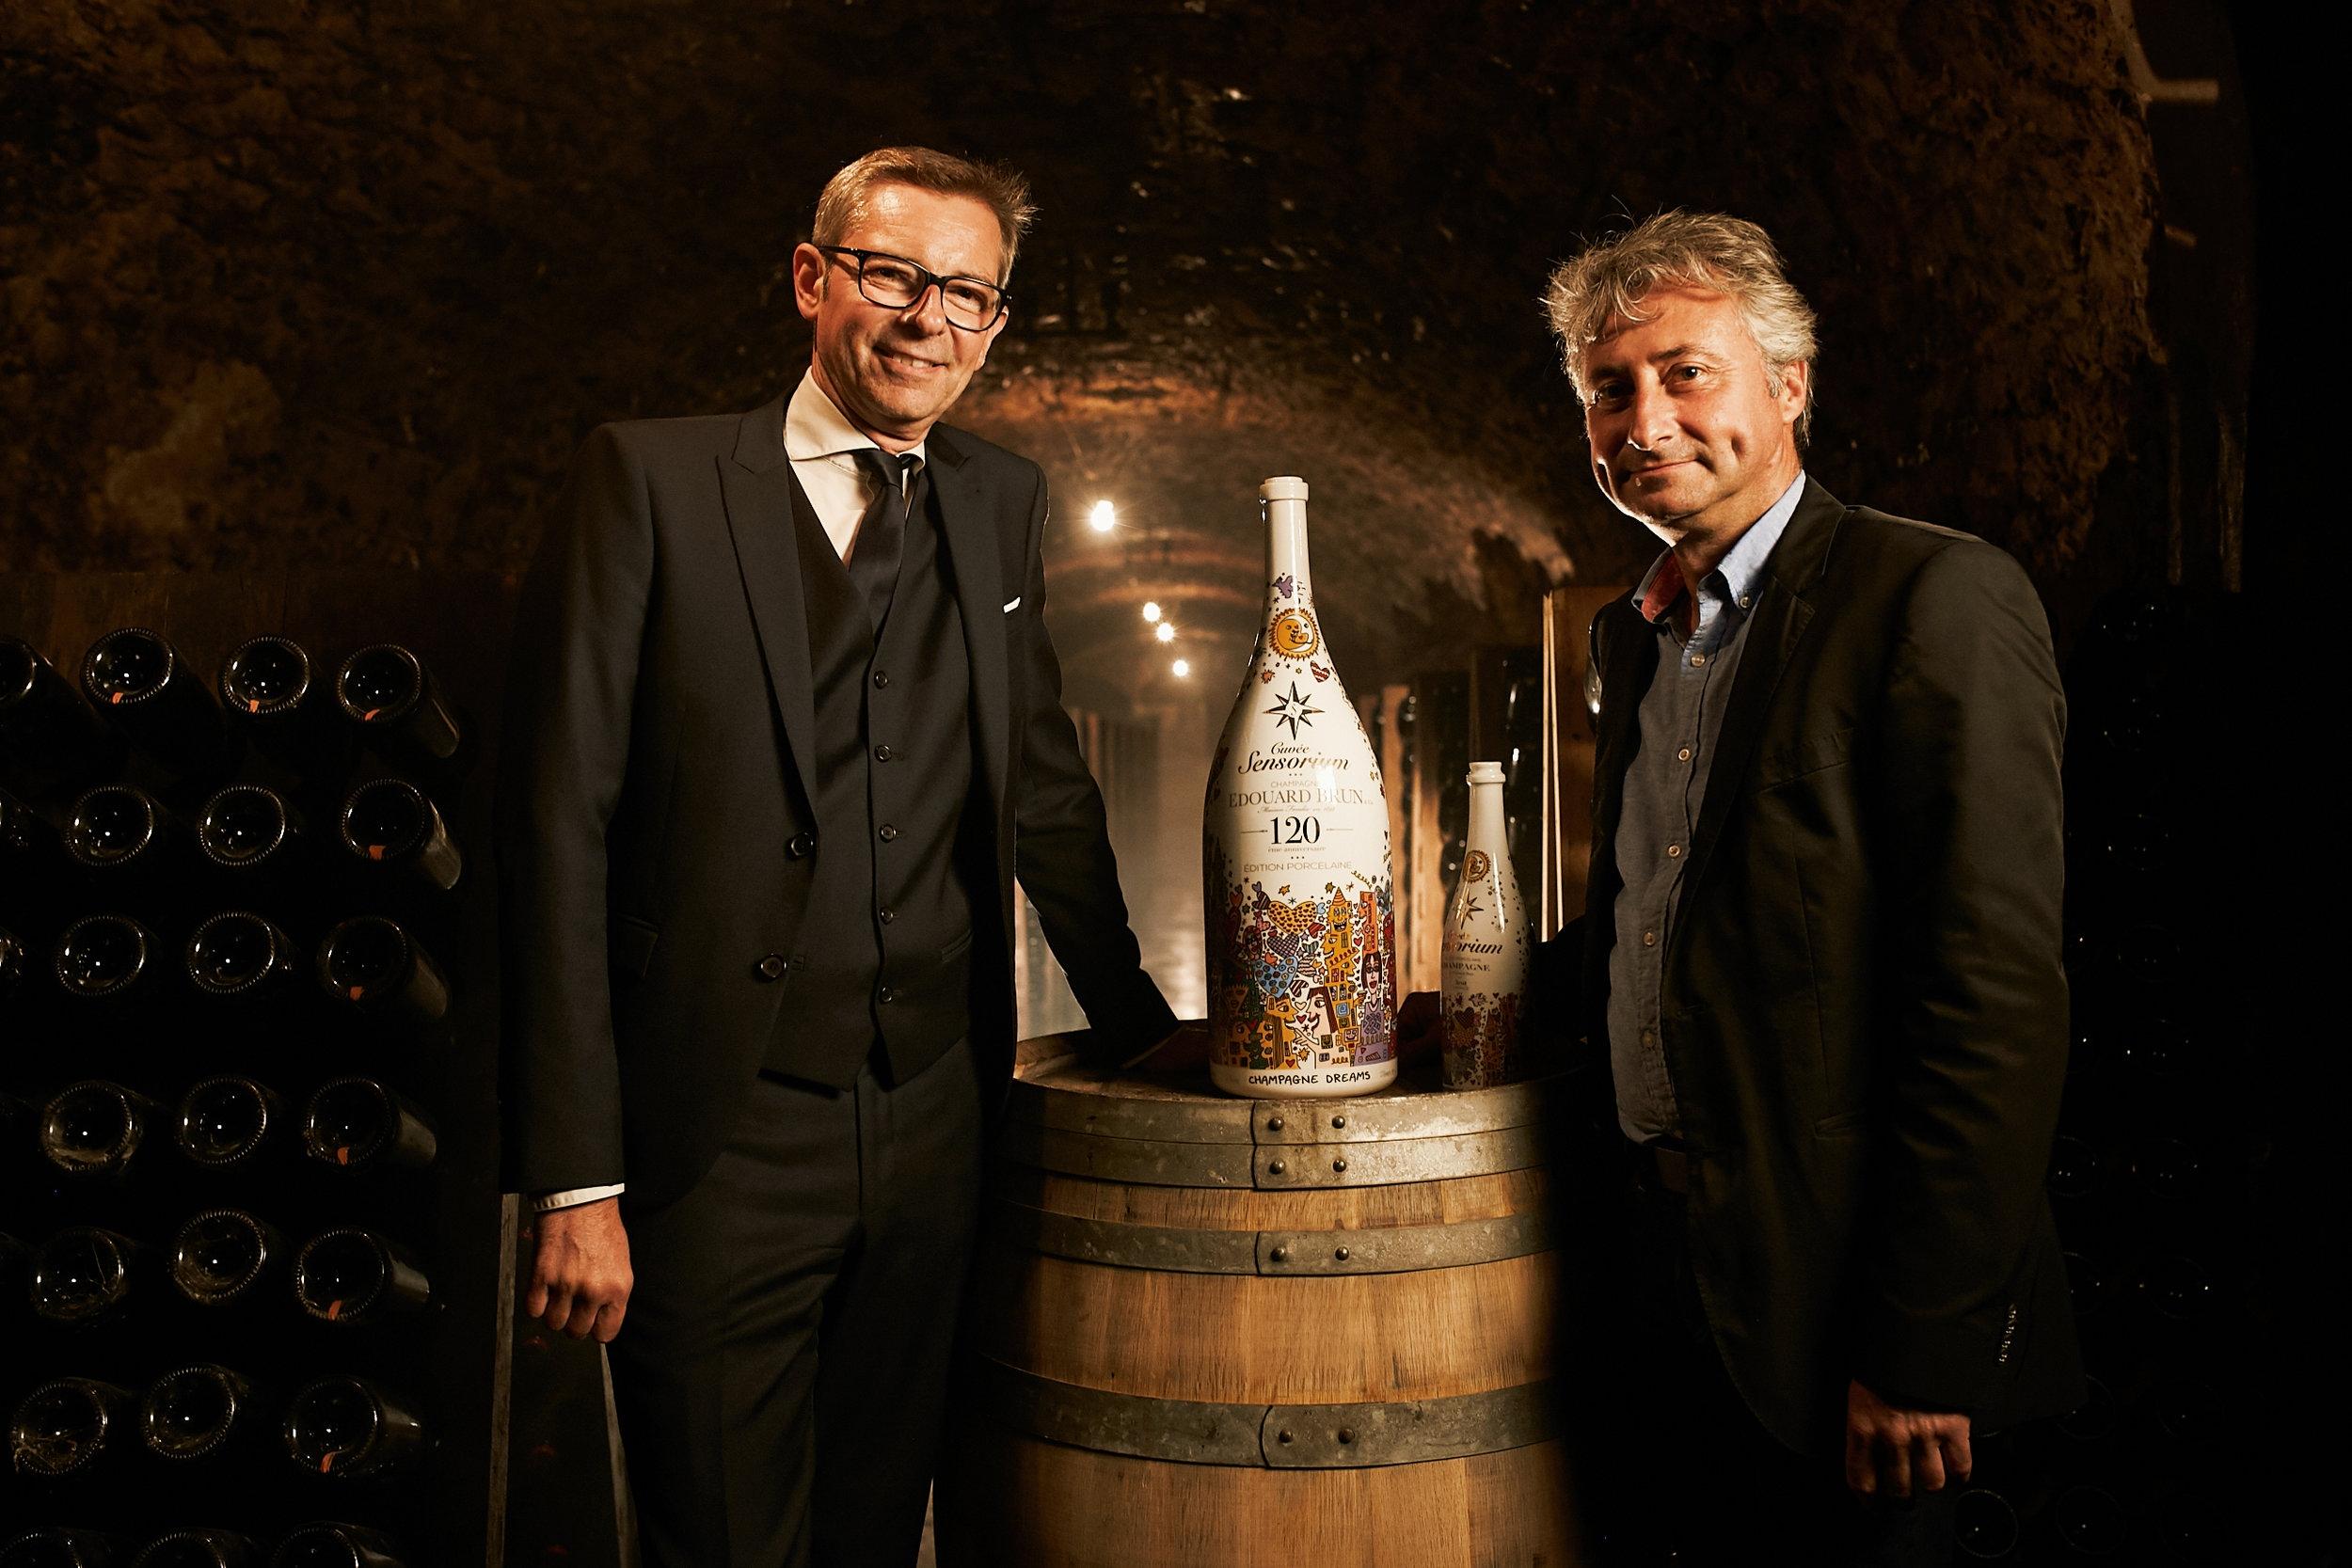 2018-06-03 Edouard Brun et Cie_Champagnerkeller_Phillippe und Manuel_ 17.jpg